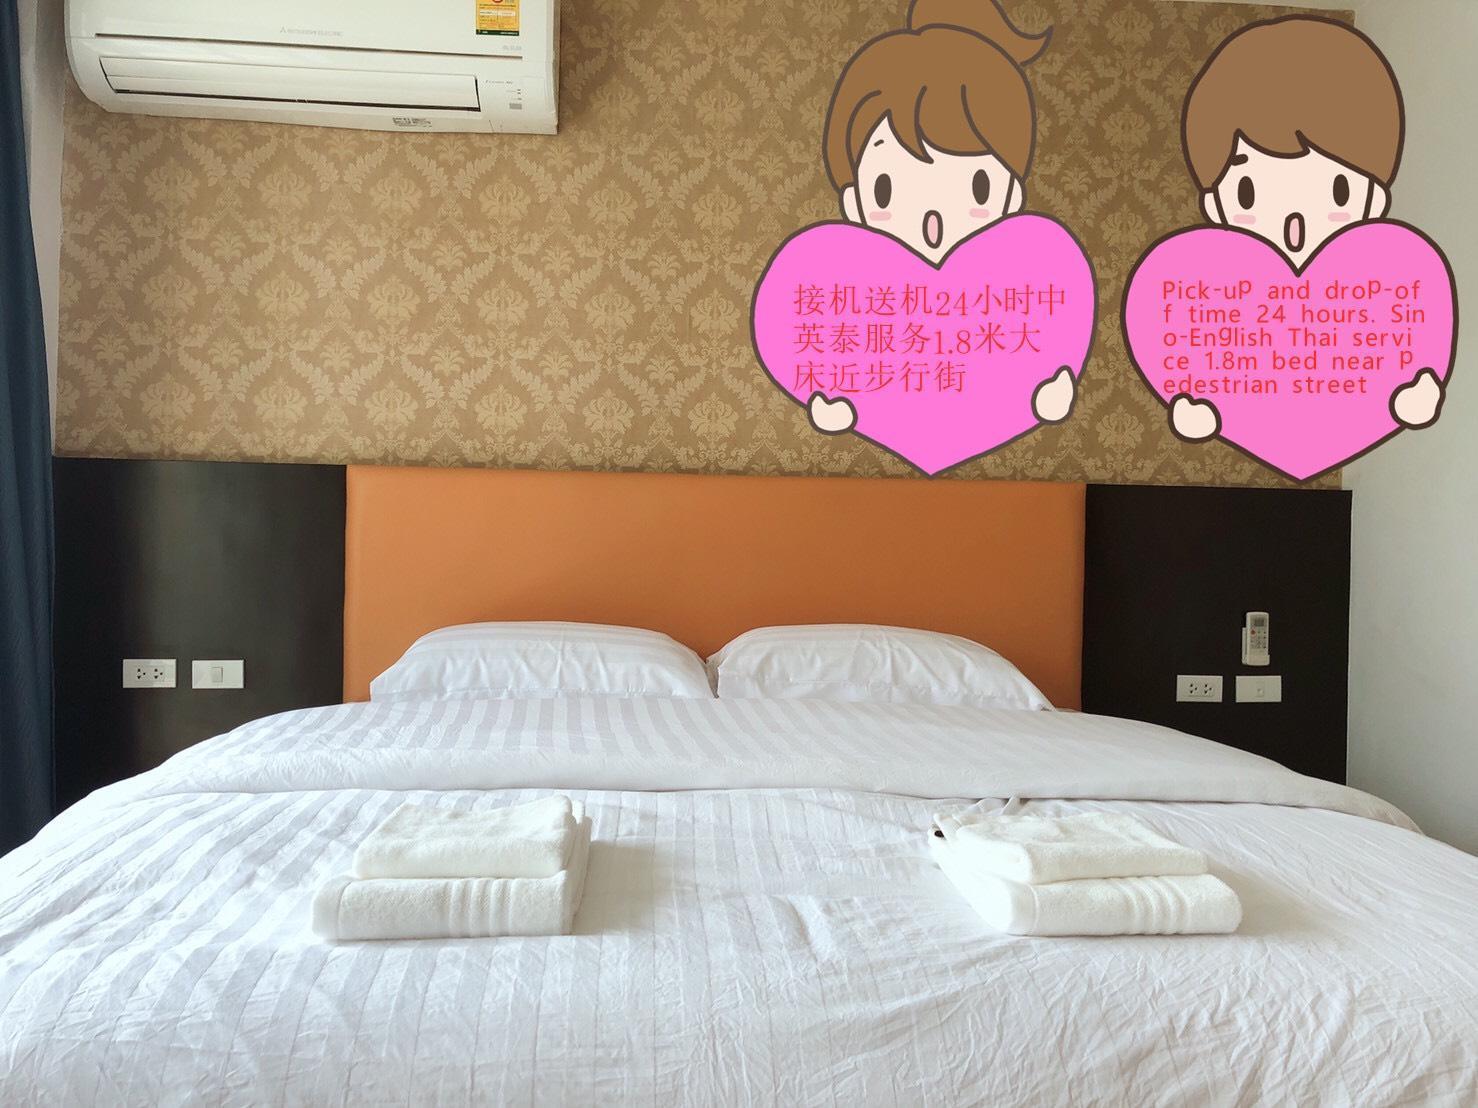 [HW]1.8m Double Room 36m2 Large Room 301 อพาร์ตเมนต์ 1 ห้องนอน 1 ห้องน้ำส่วนตัว ขนาด 29 ตร.ม. – พัทยากลาง